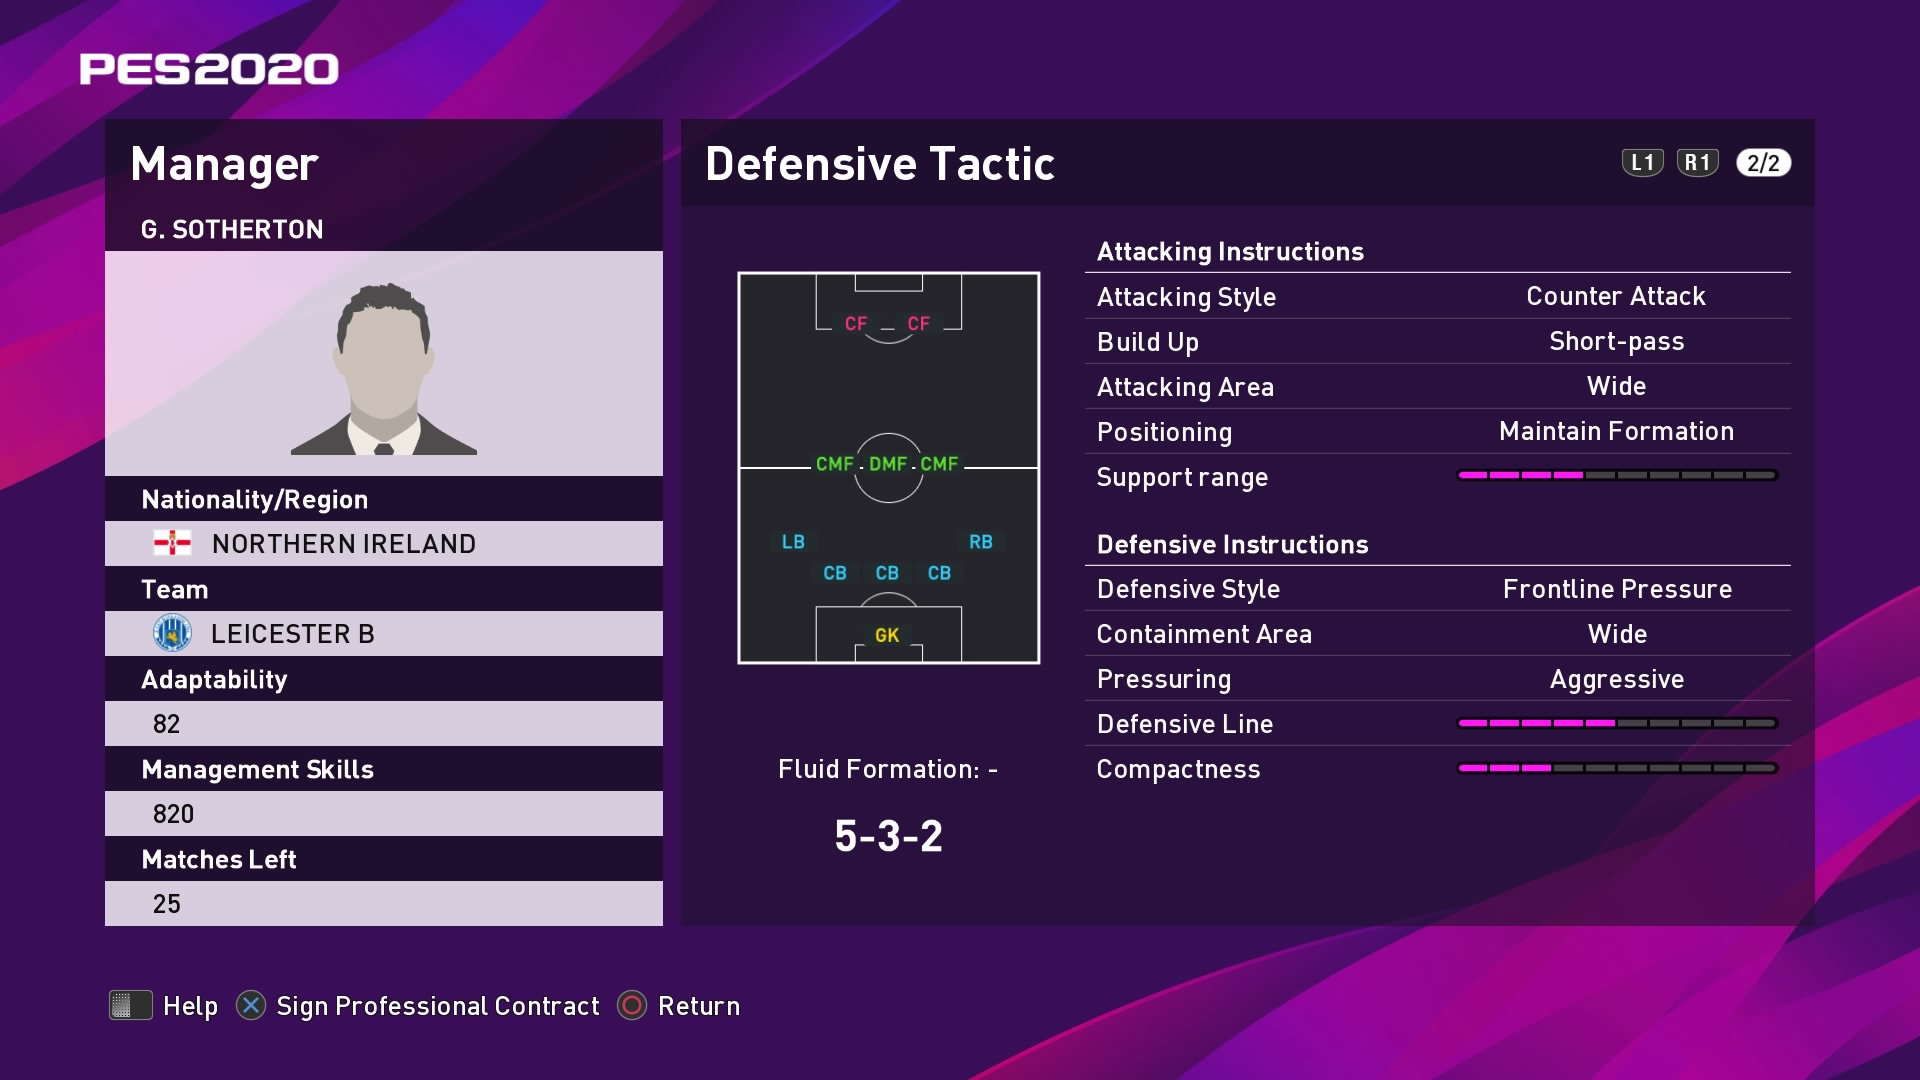 G. Sotherton (4) (Brendan Rodgers) Defensive Tactic in PES 2020 myClub